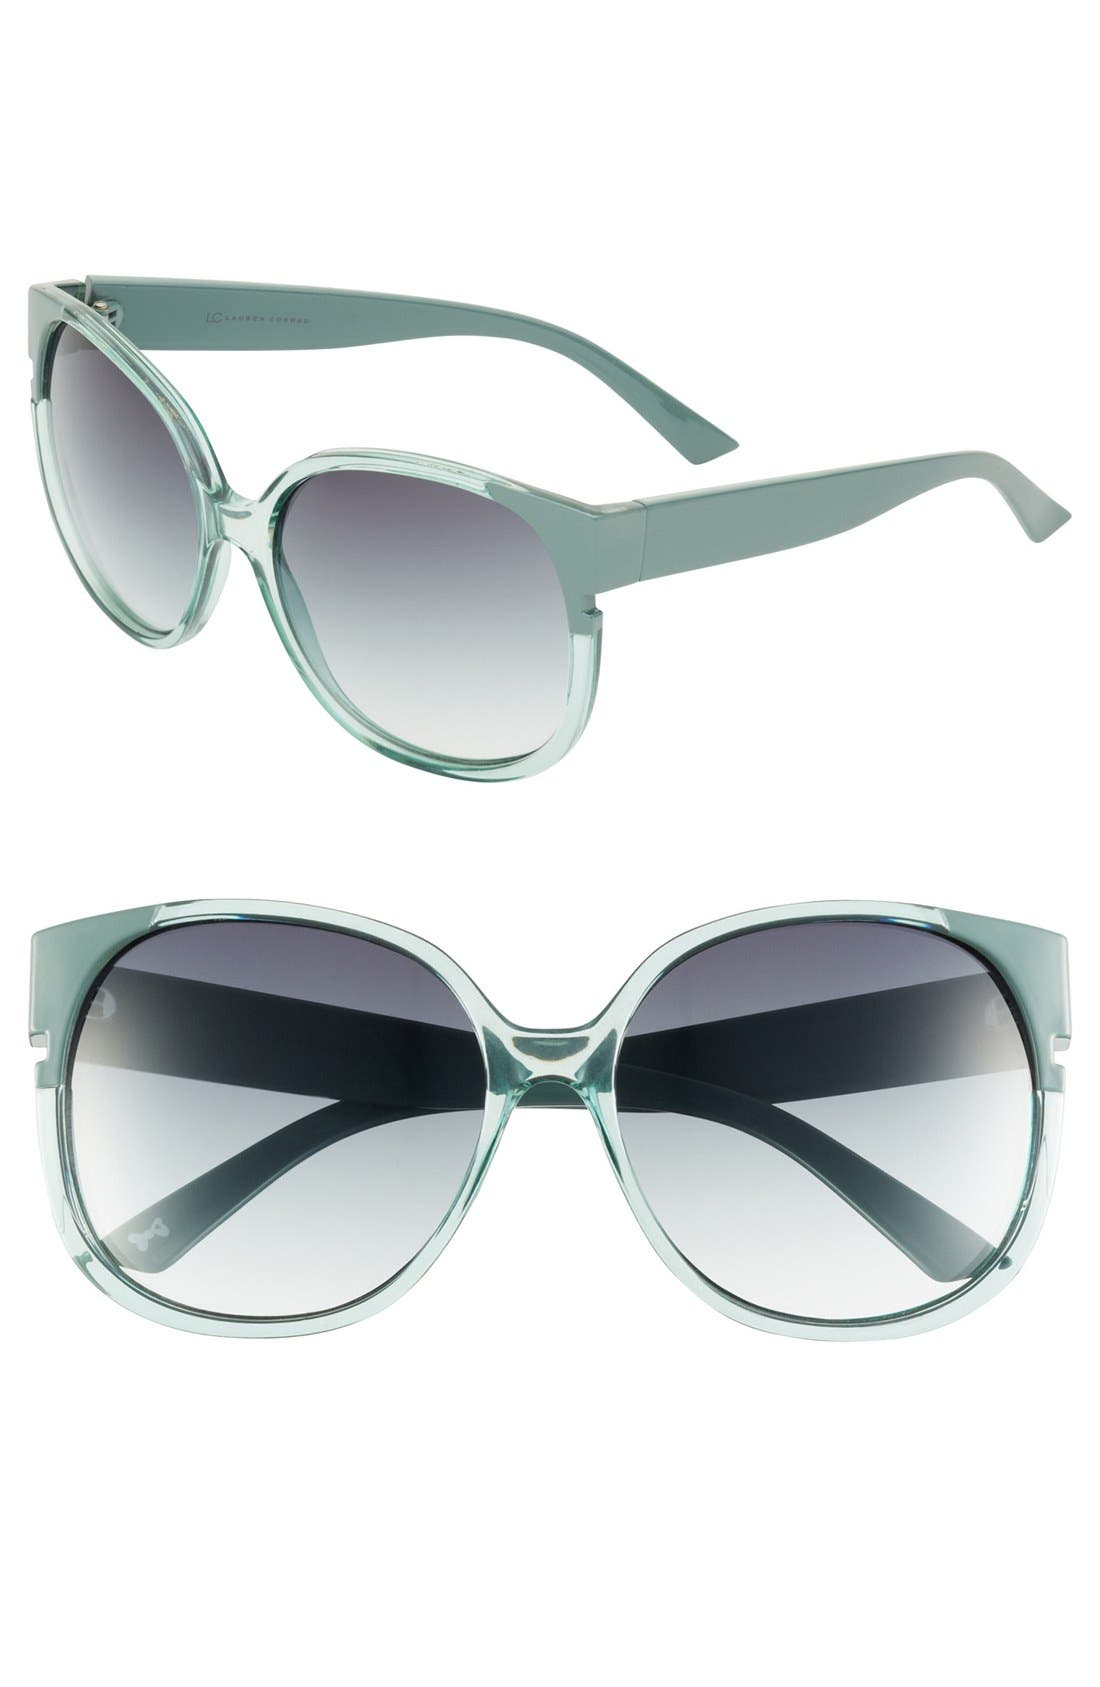 Alternate Image 1 Selected - Outlook Eyewear 'Corona del Mar' 59mm Sunglasses